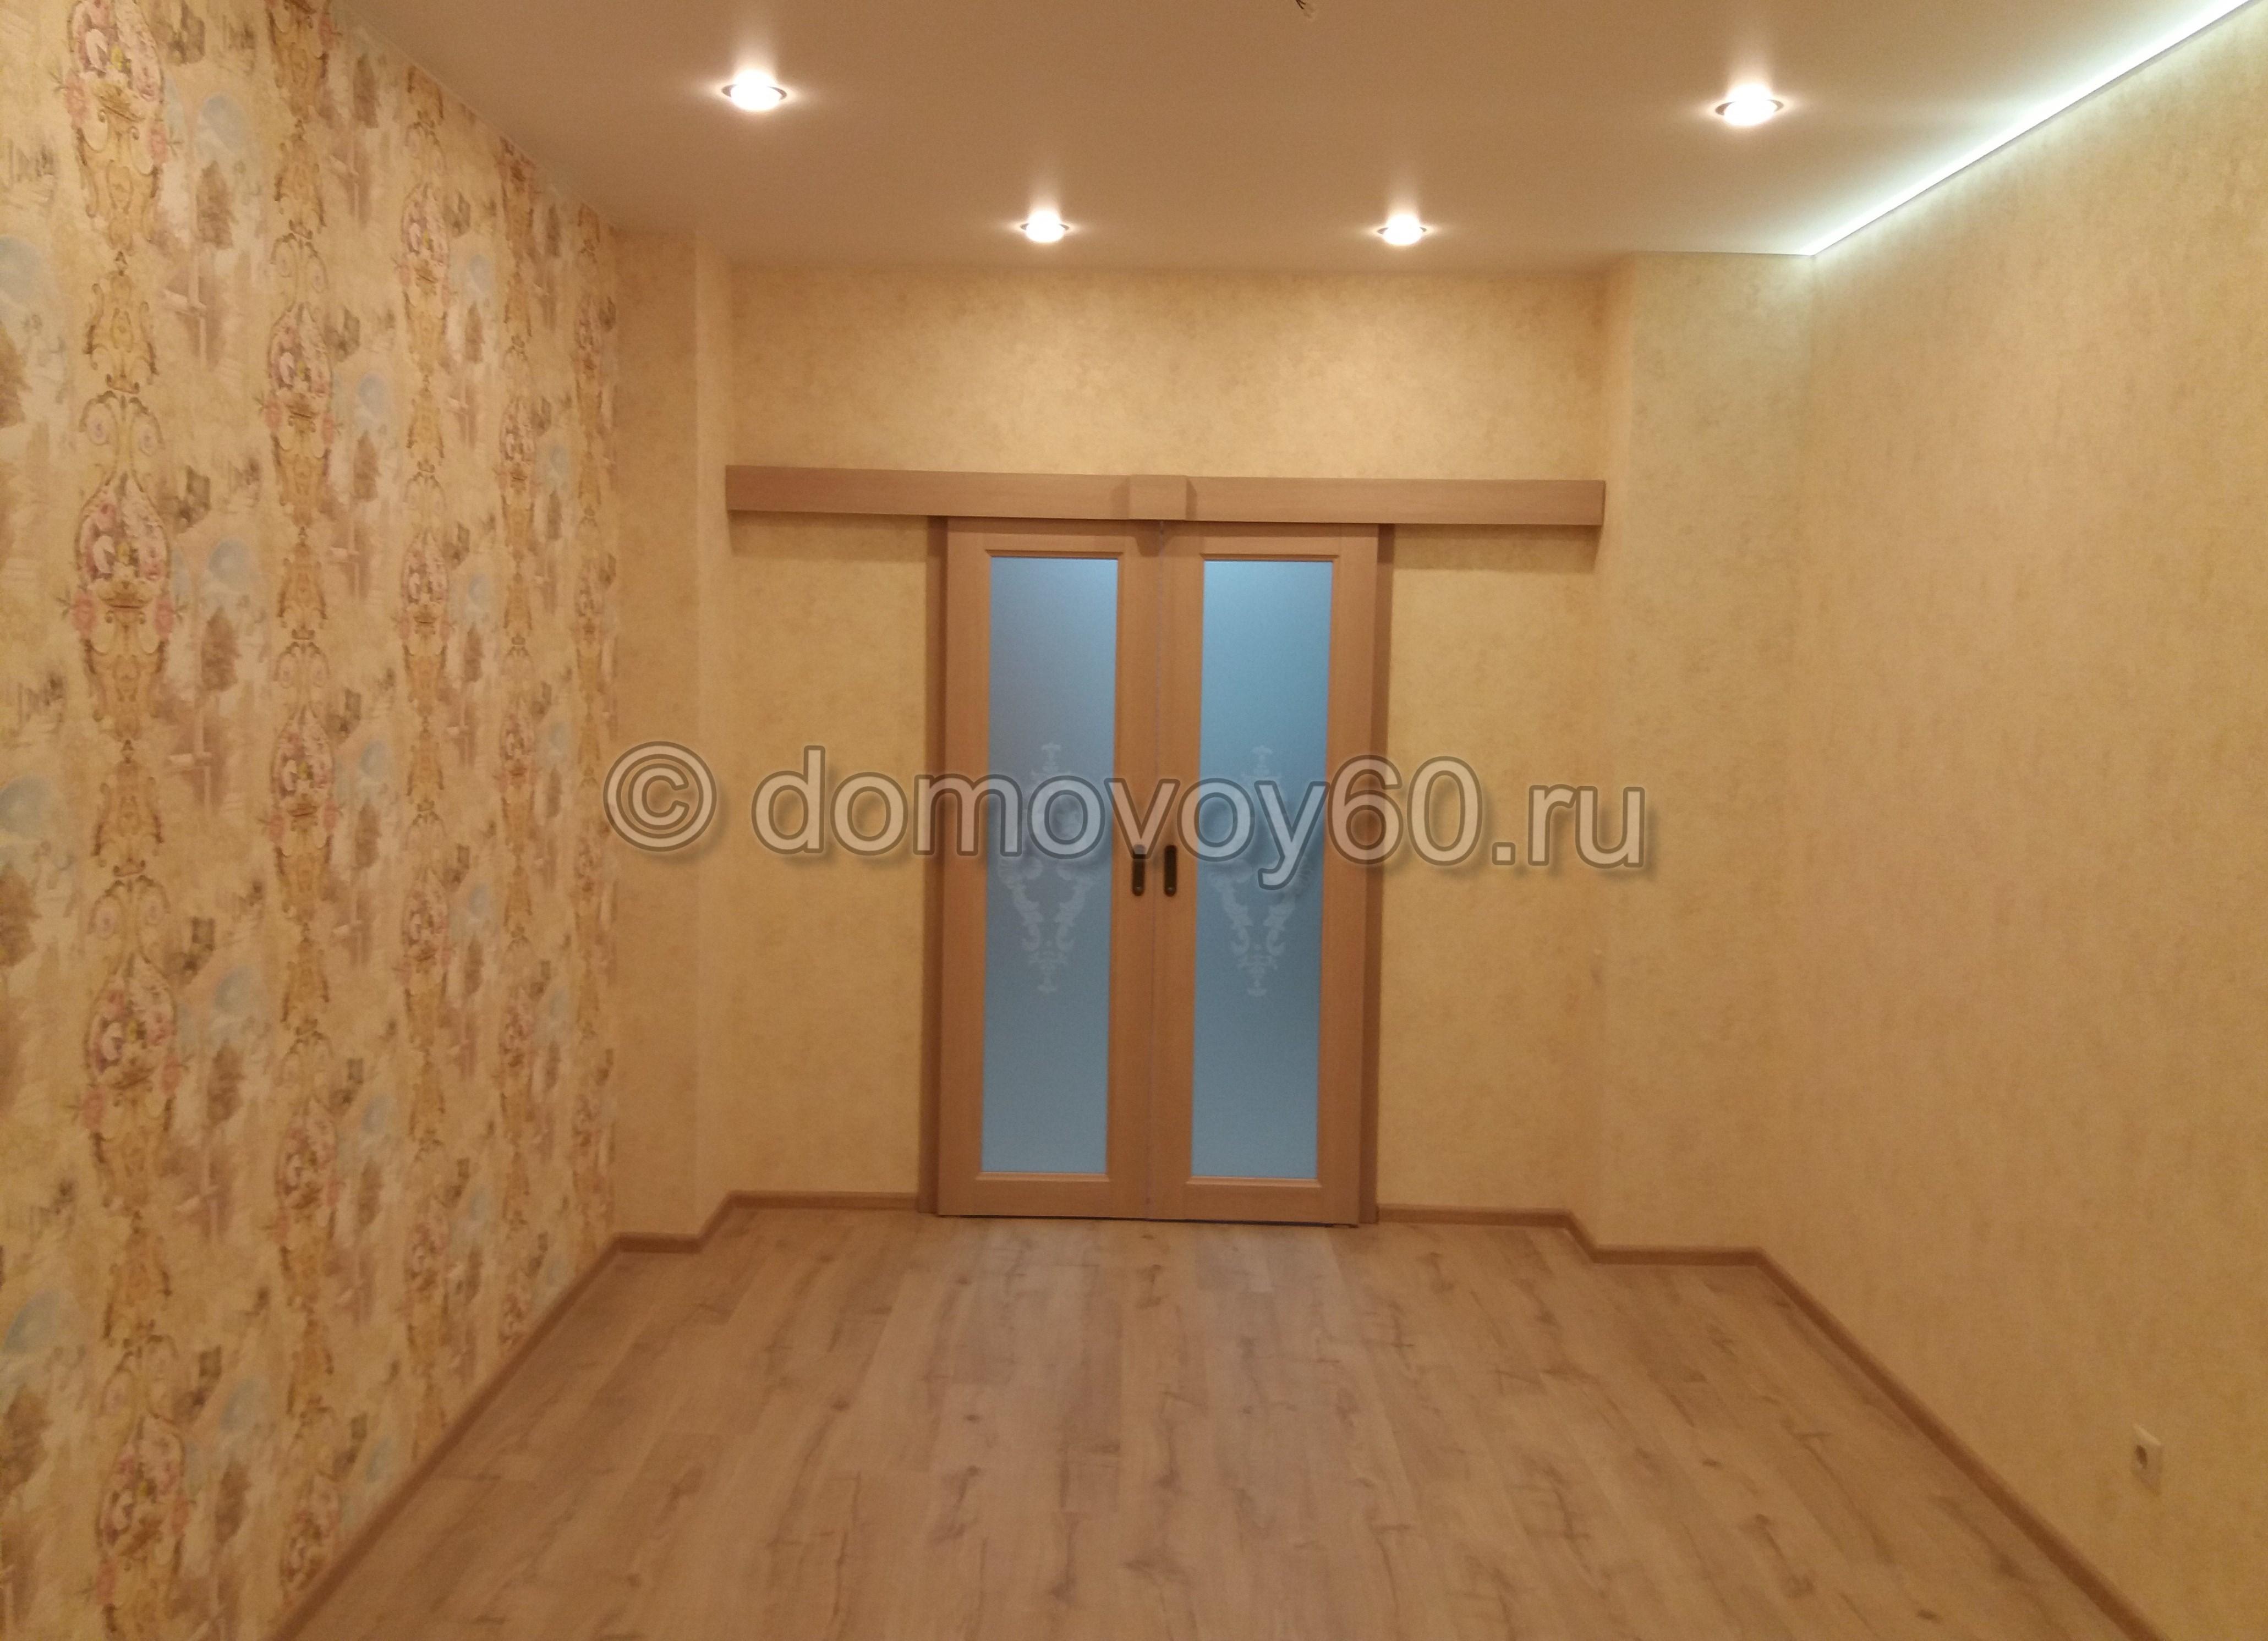 domovoy60-020